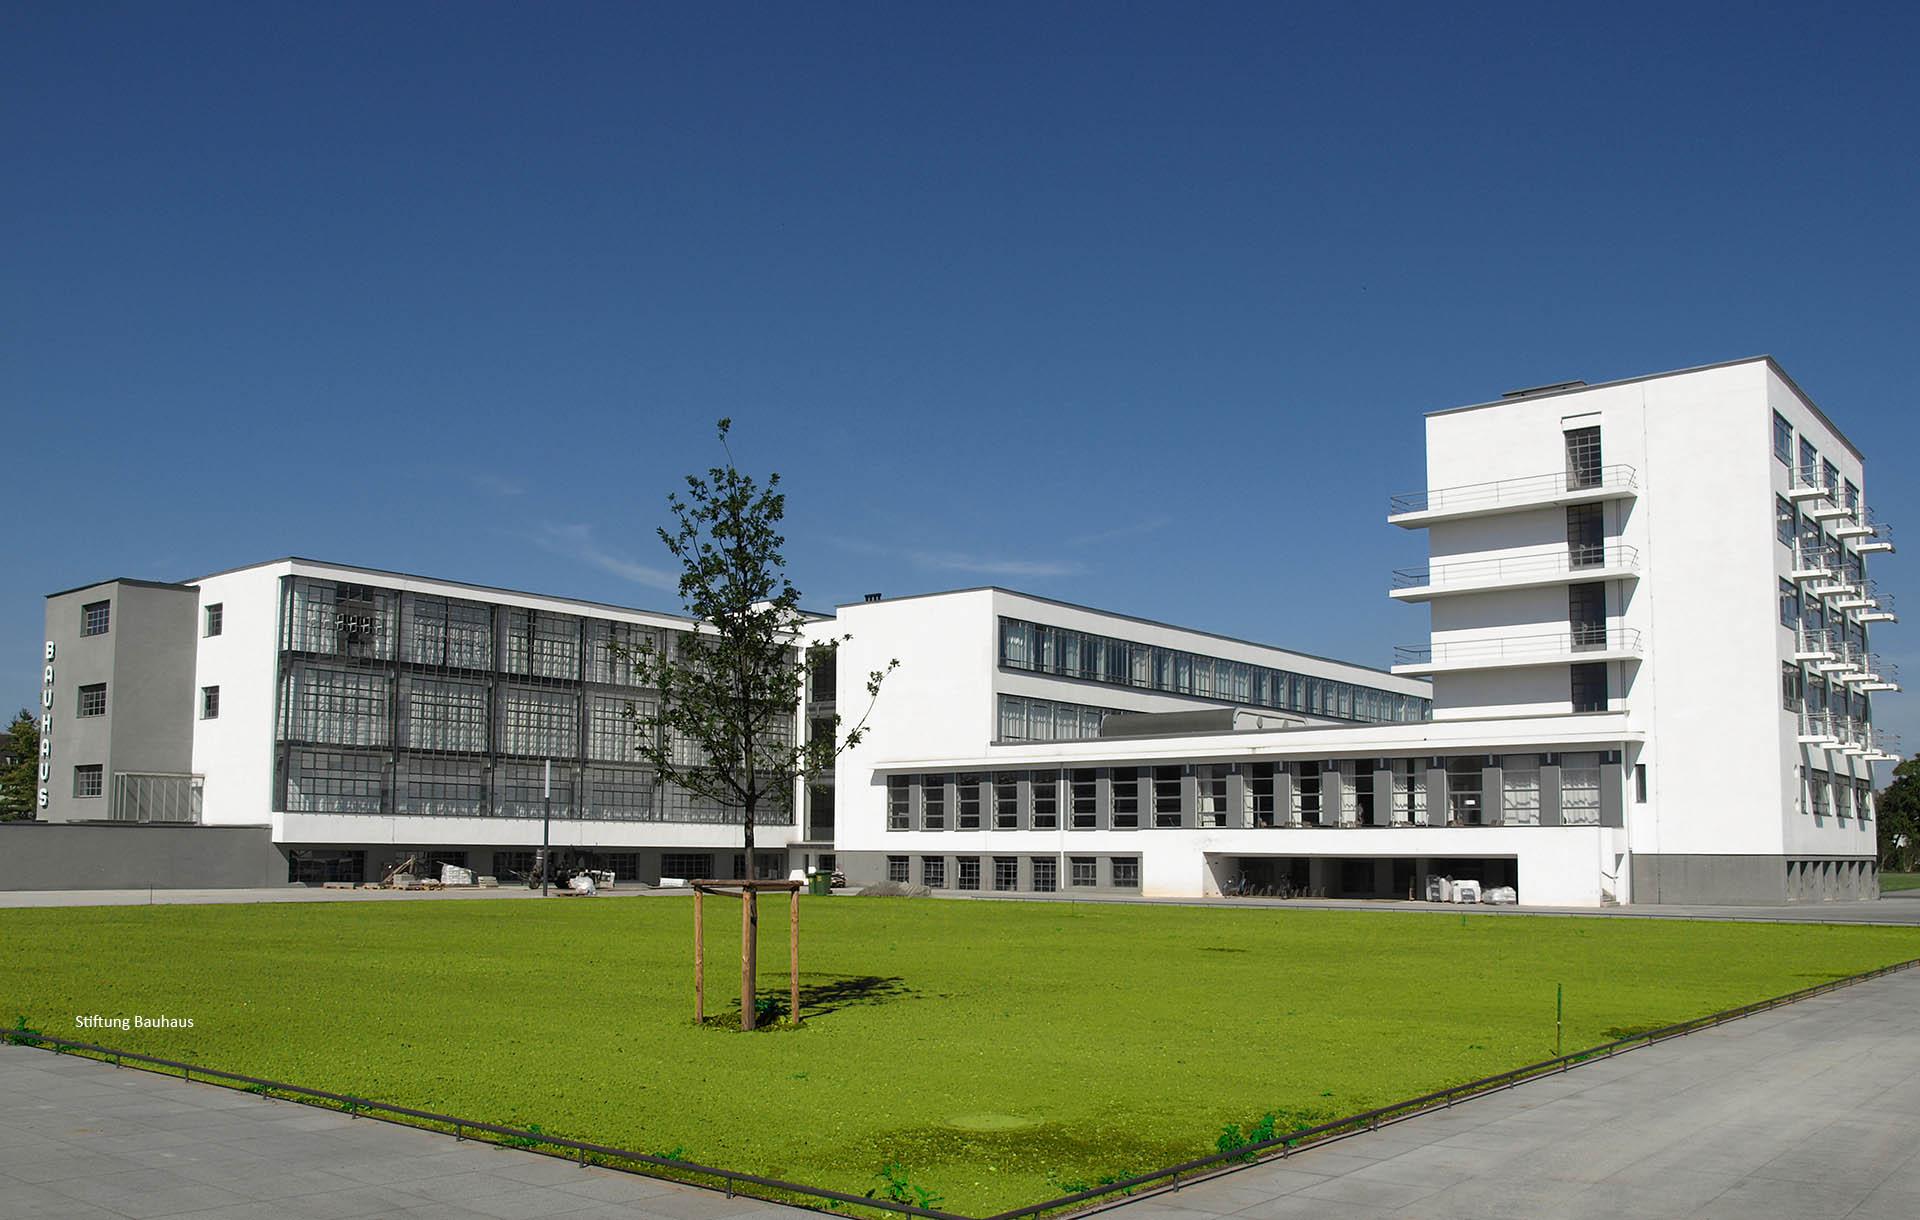 Bauhaus Dessau renovation with MHB classic-iso